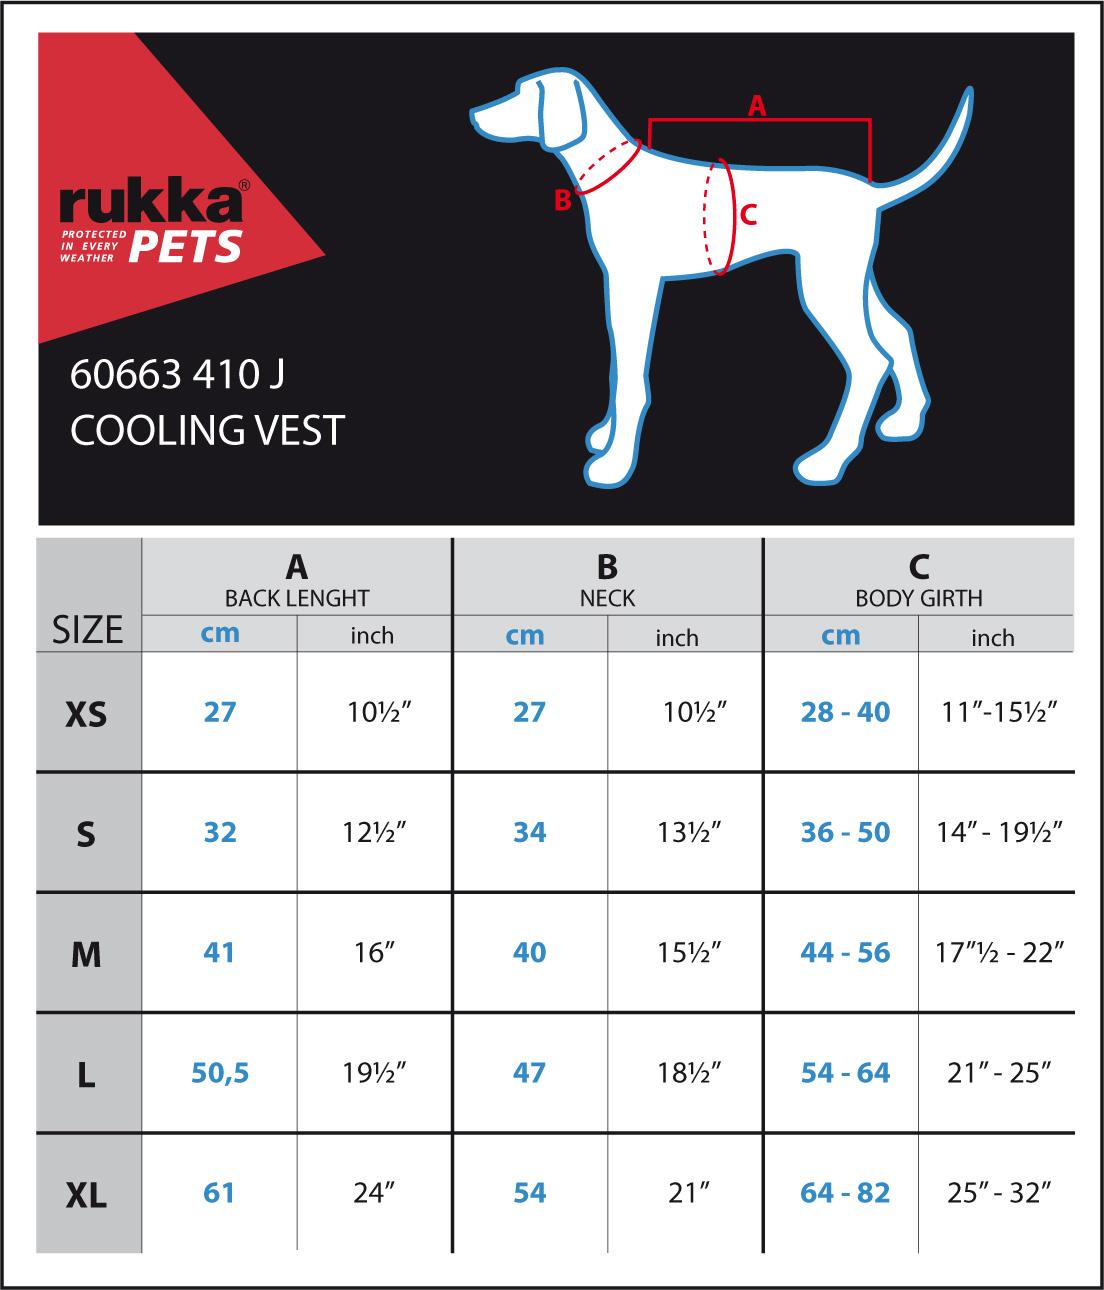 Maattabel RukkaPets Cooling Vest